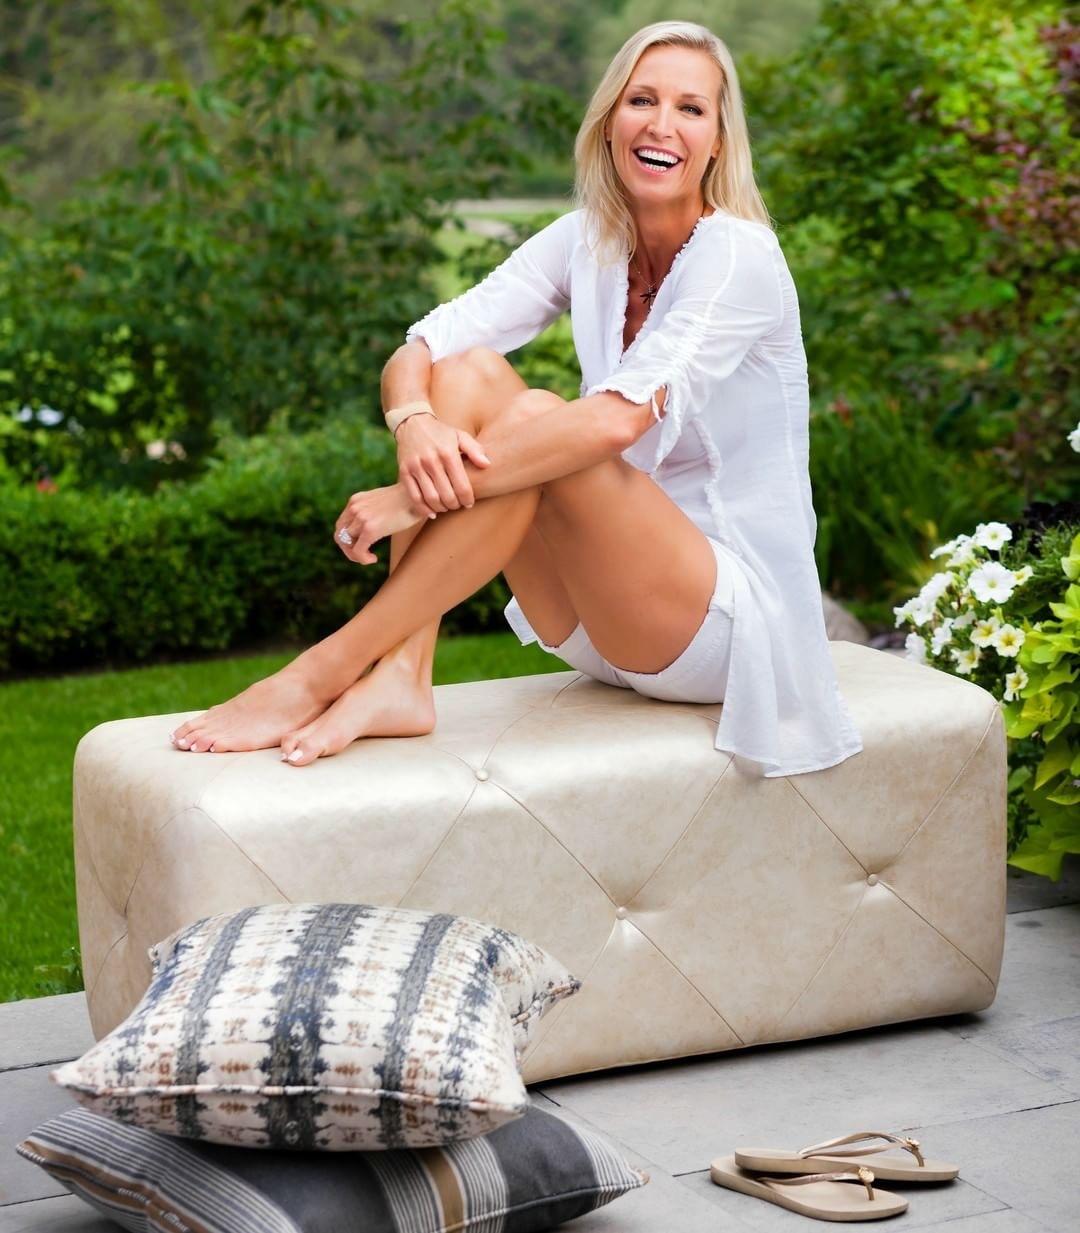 Candice Olson Feet